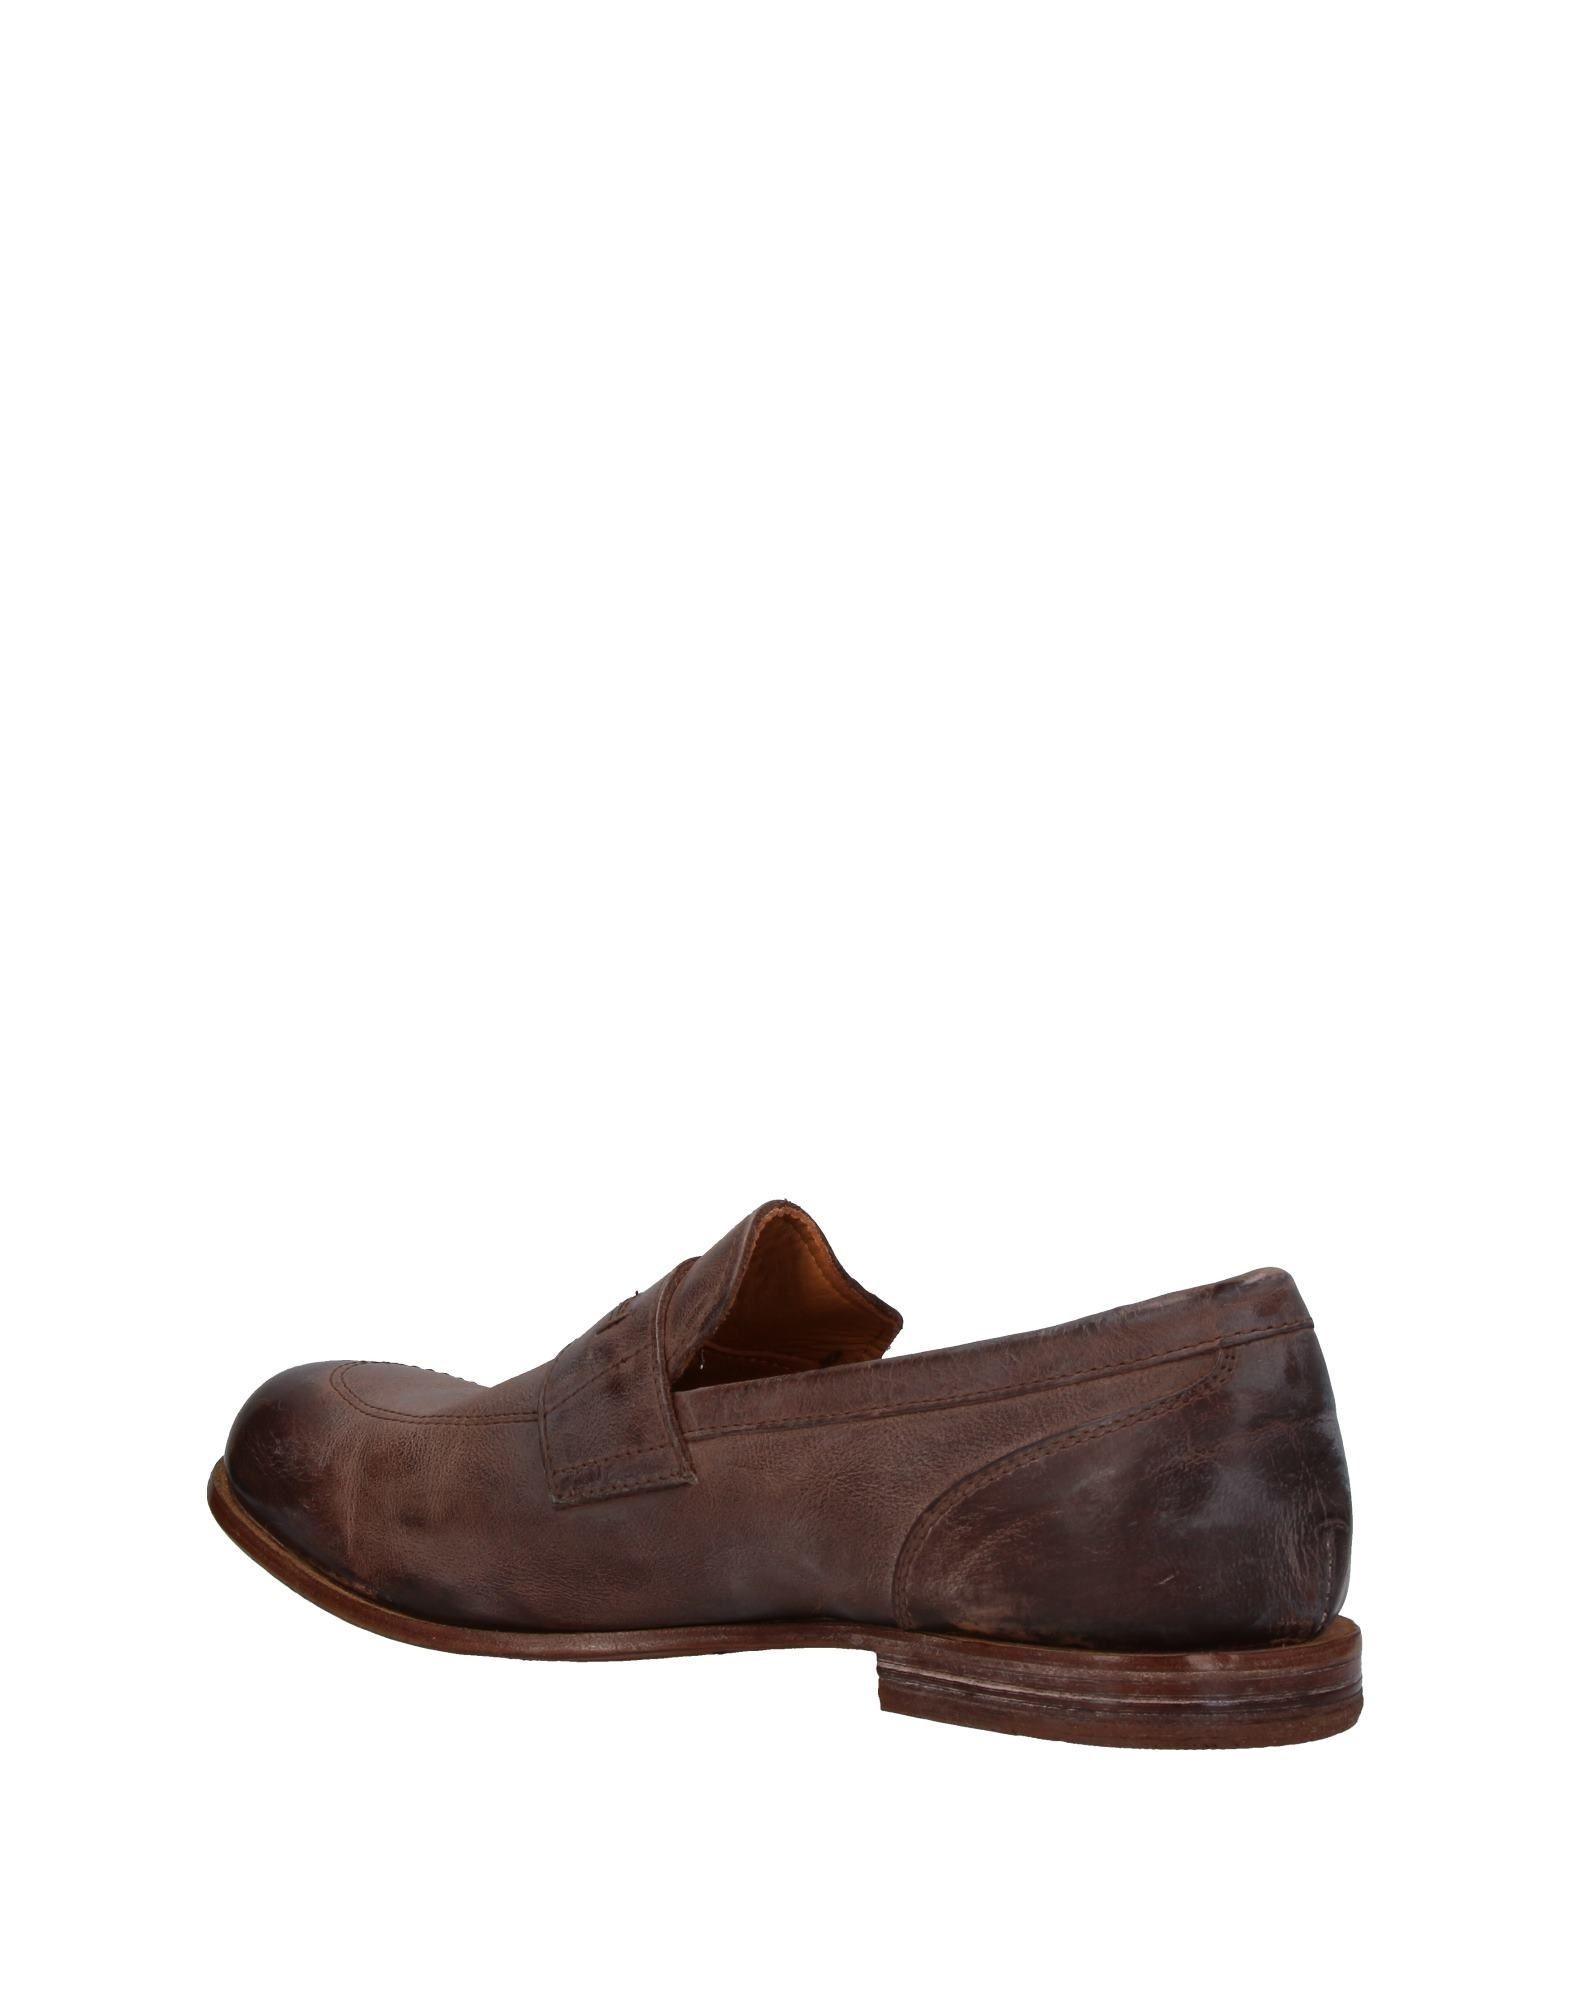 Moma Gute Mokassins Herren  11412030NU Gute Moma Qualität beliebte Schuhe c70ec9